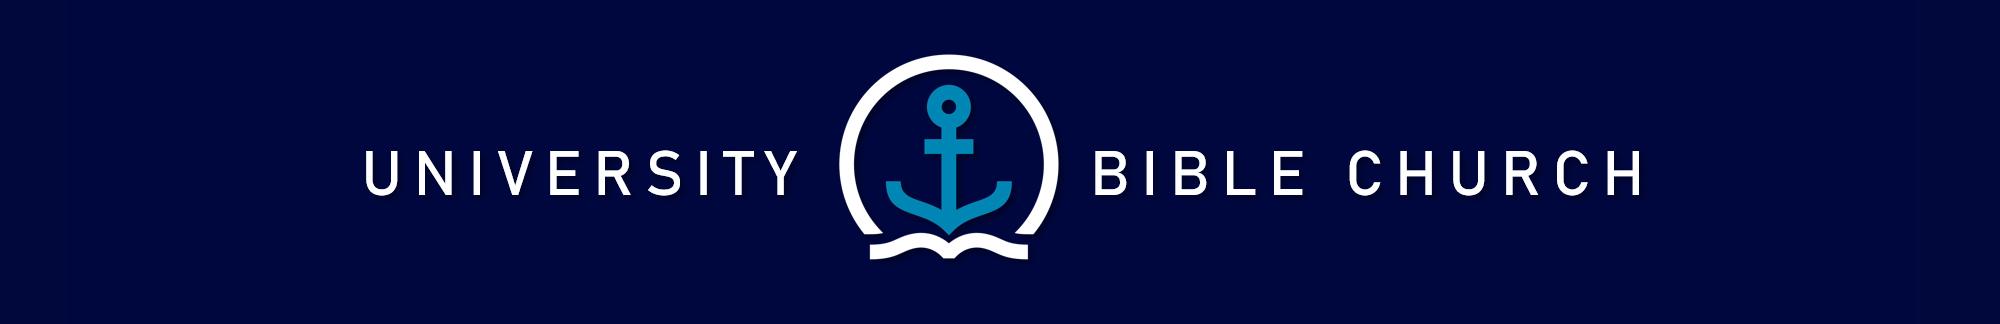 University Bible Church Logo